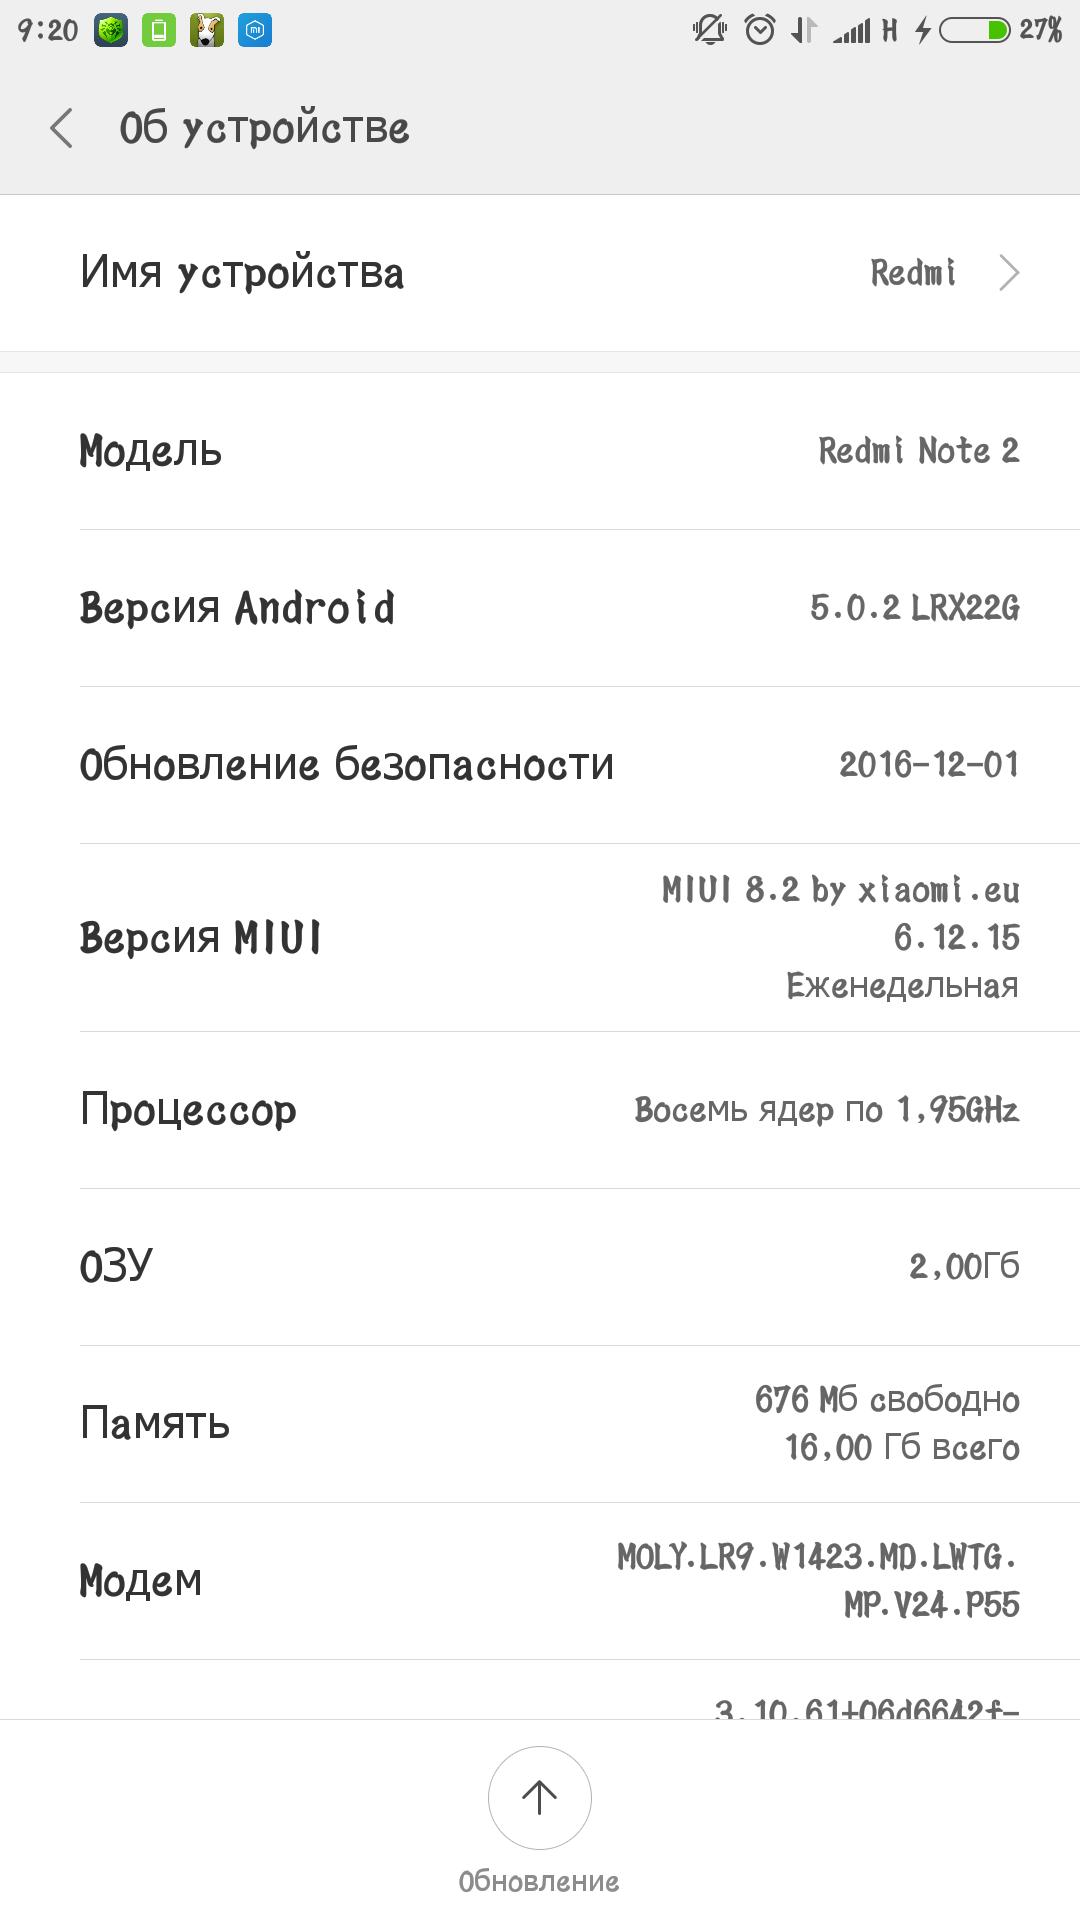 Screenshot_2016-12-22-09-20-18-852_com.android.settings.png